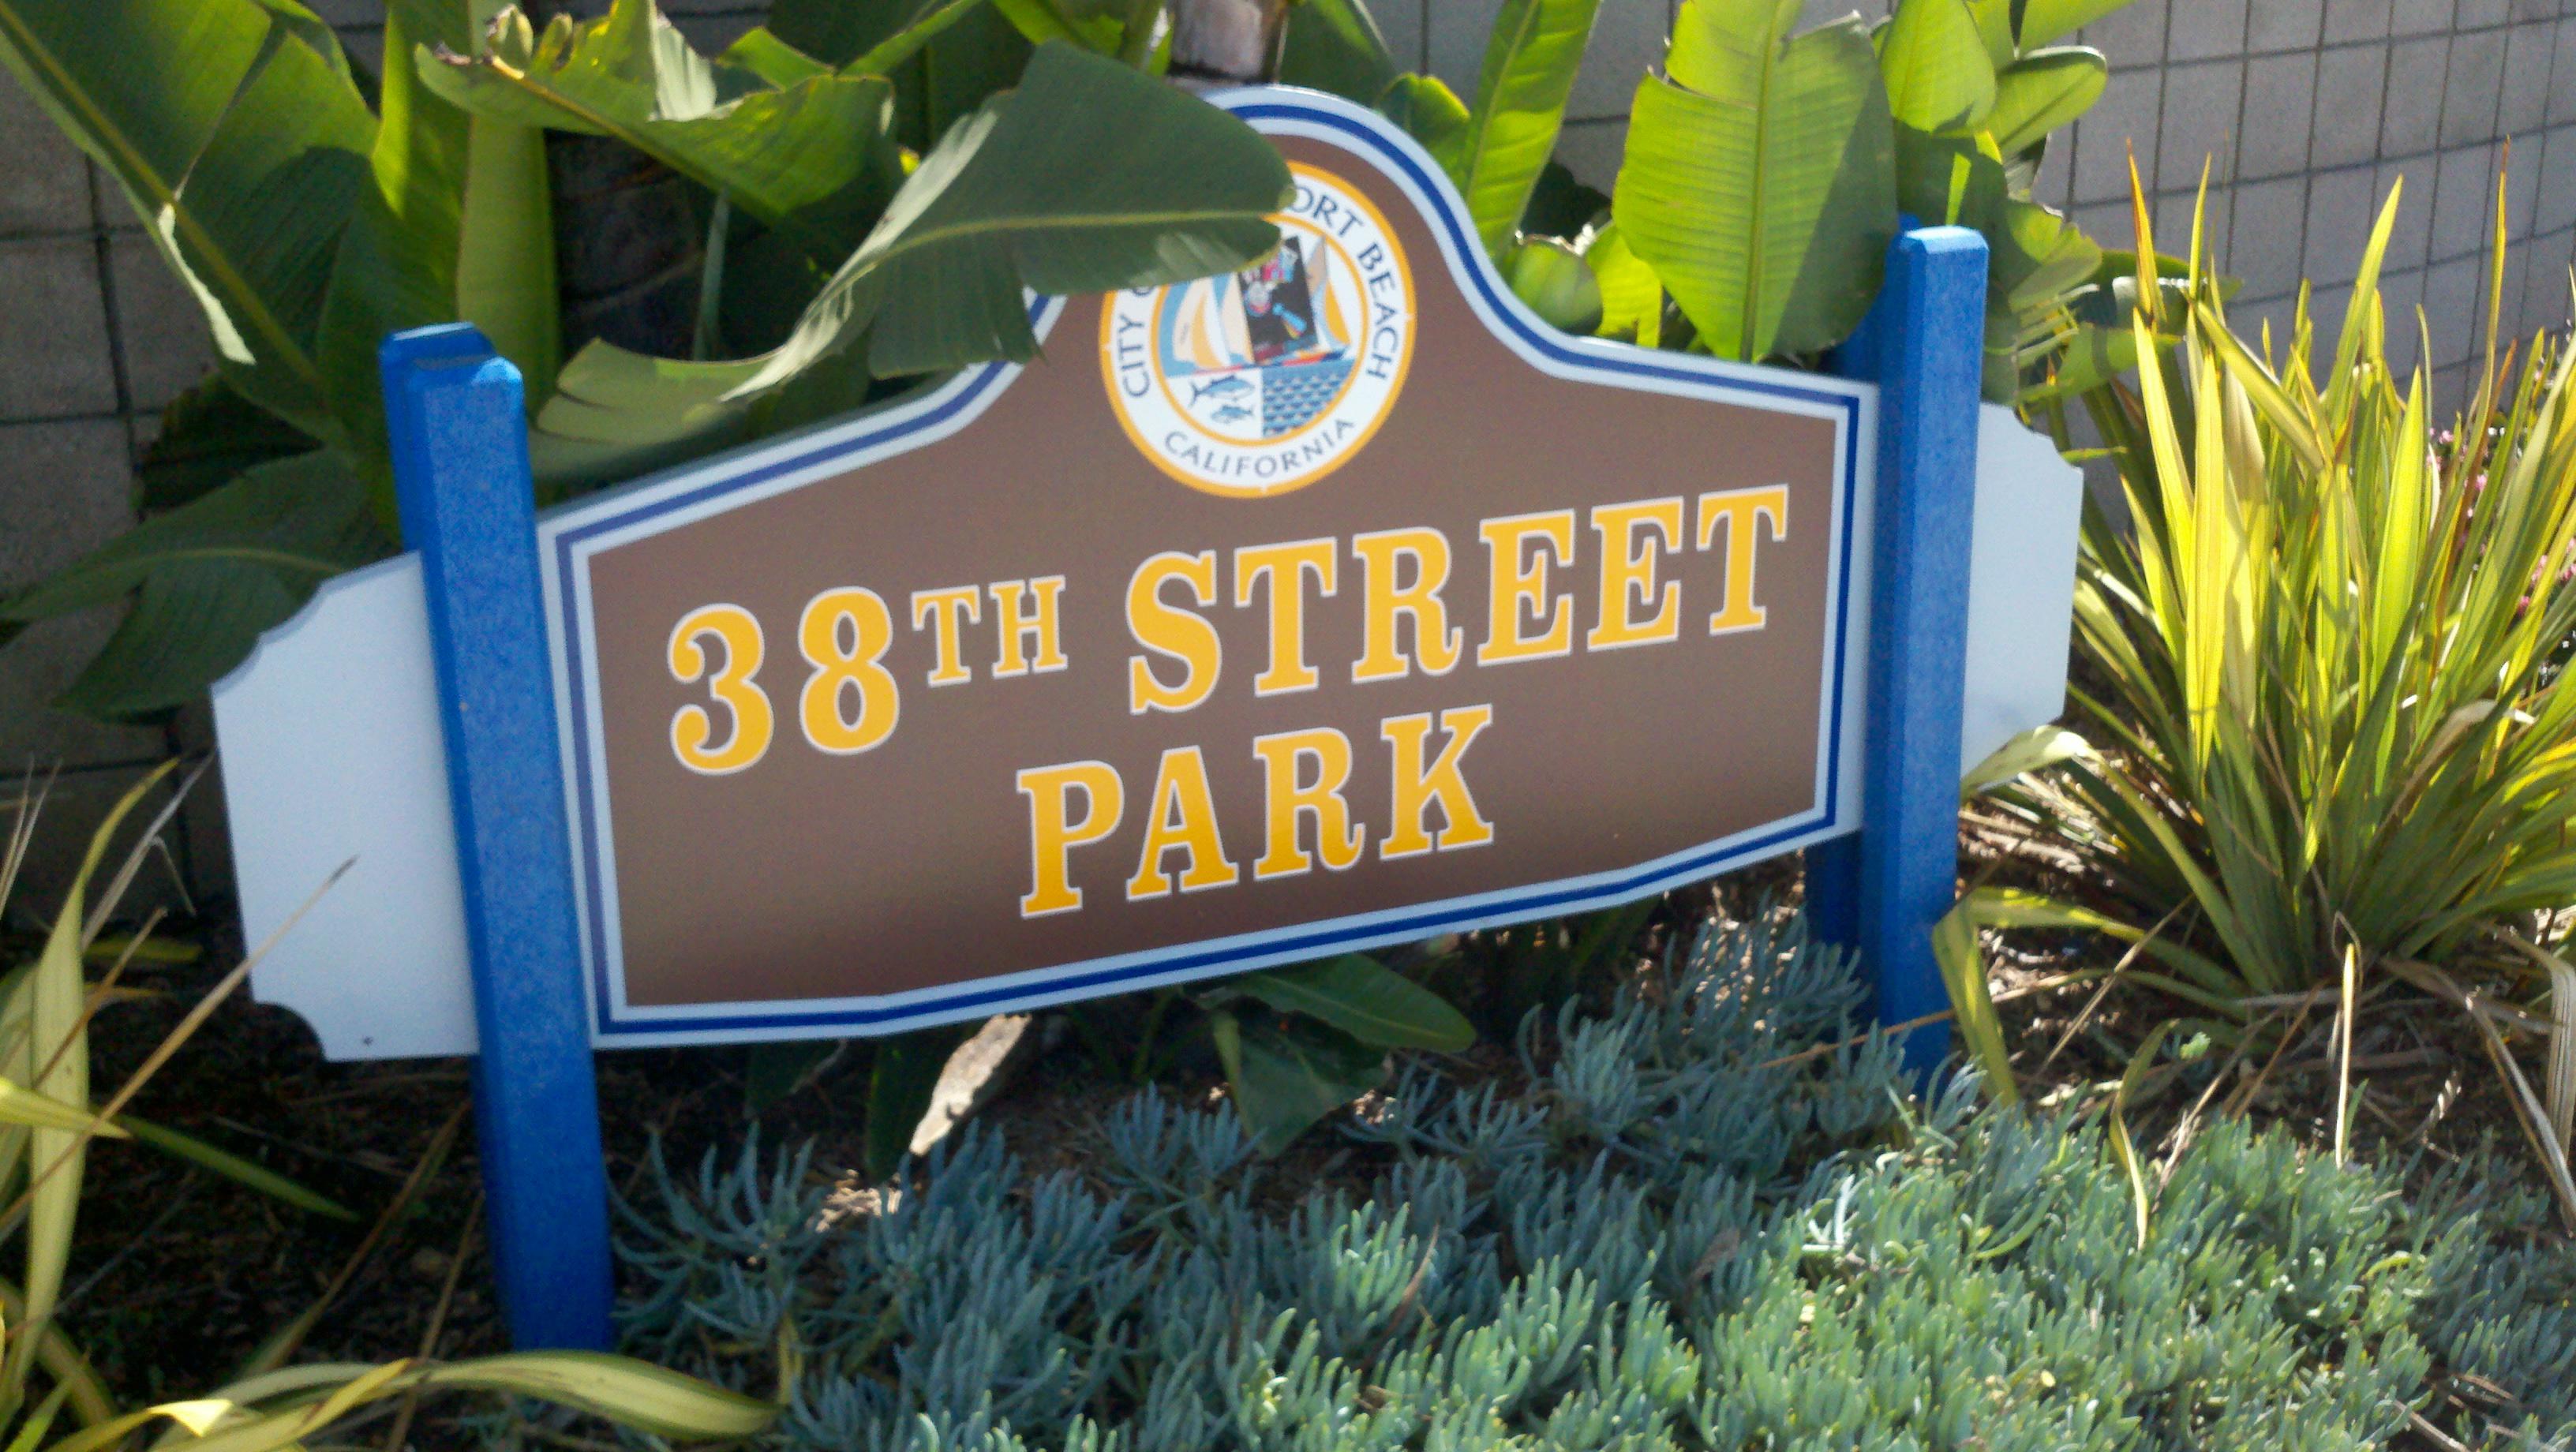 38th street park